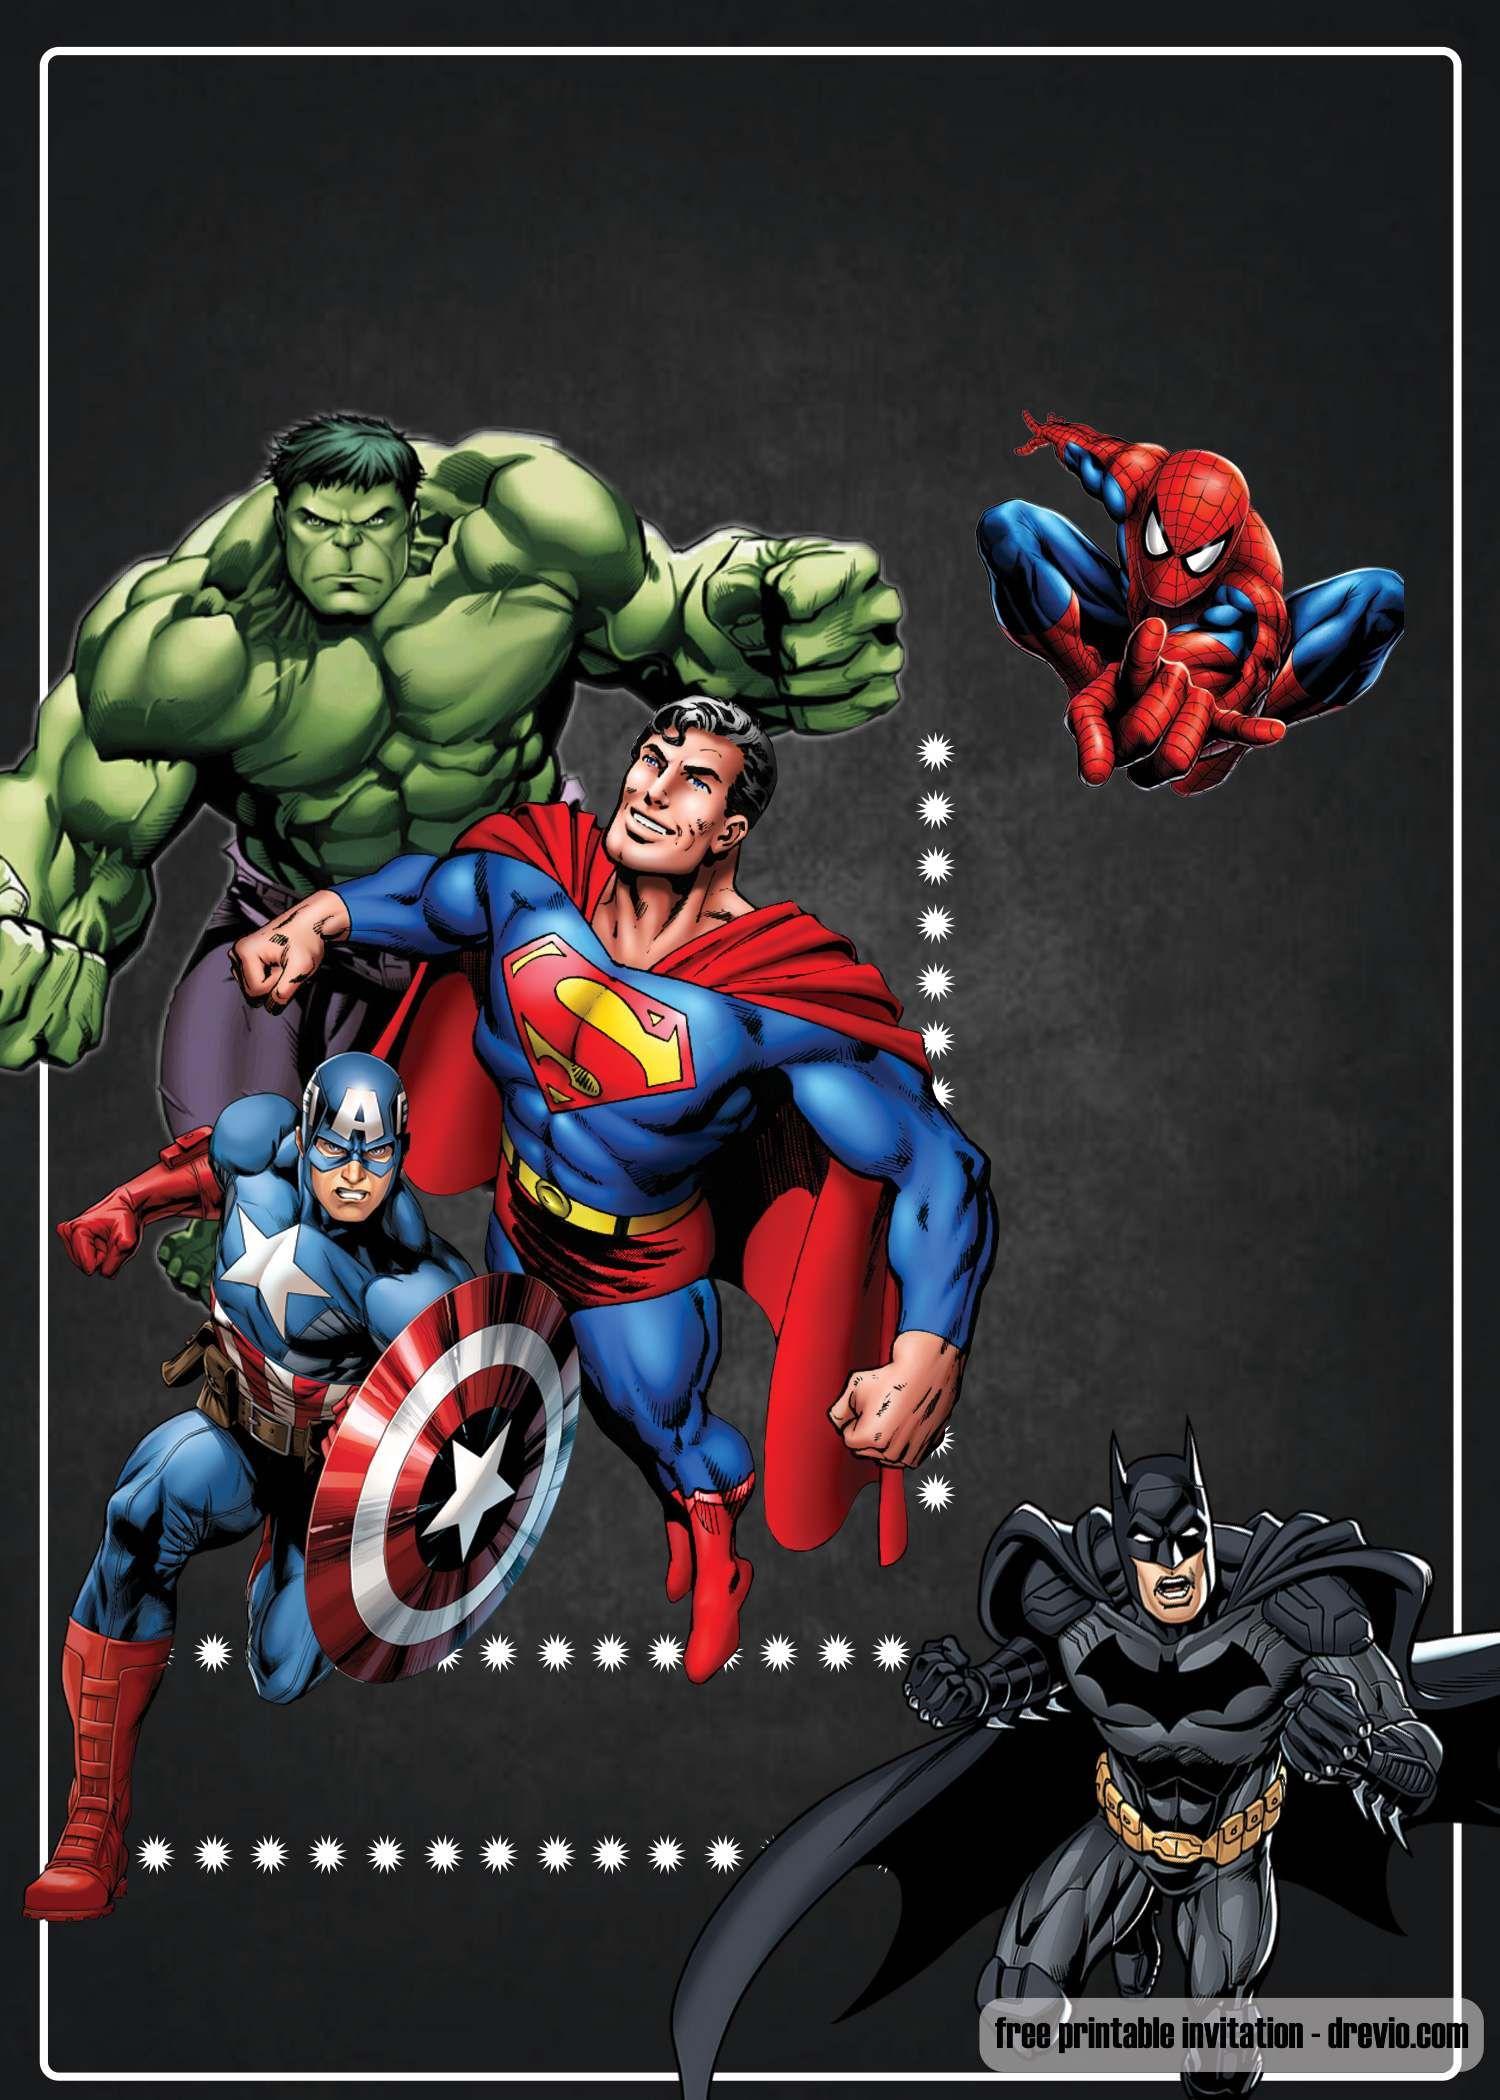 Free Printable Chalkboard Superhero Invitation Template Decoracao Vingadores Festa Infantil Aniversario Super Herois Festa Dos Vingadores